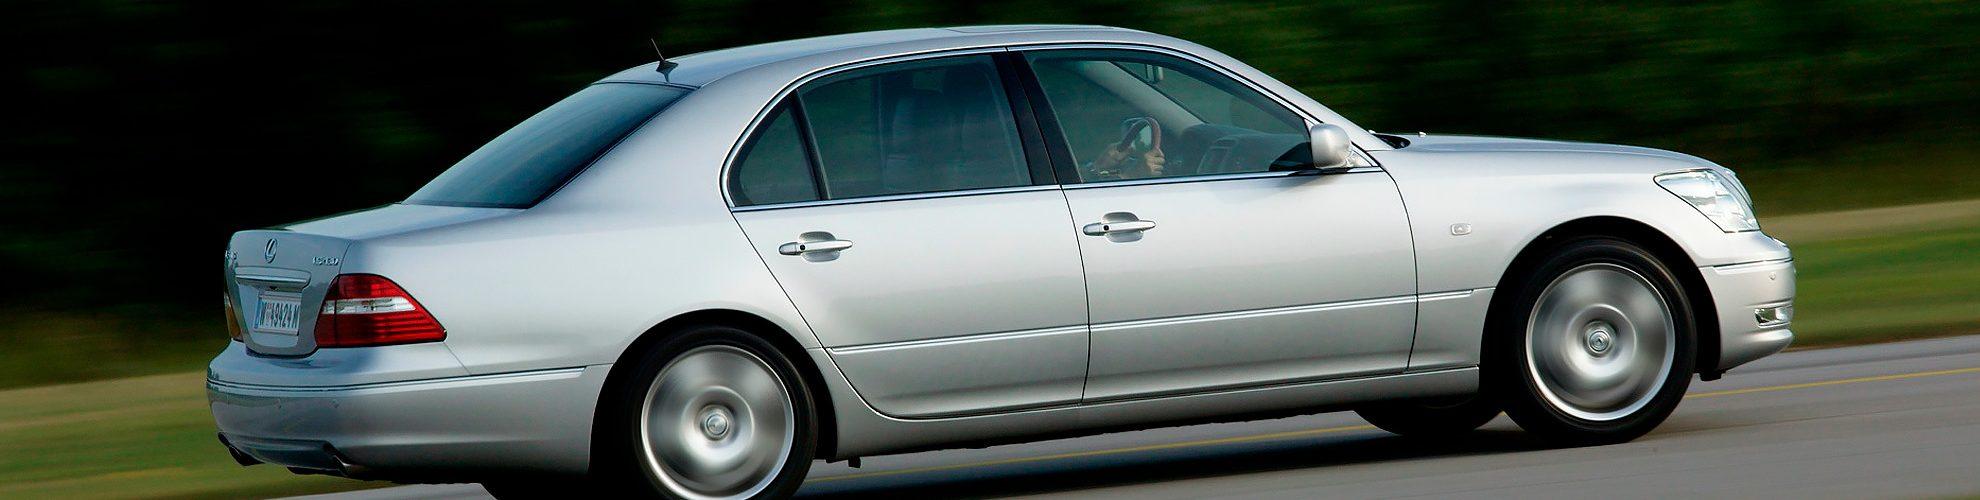 Технические характеристики Lexus LS 430